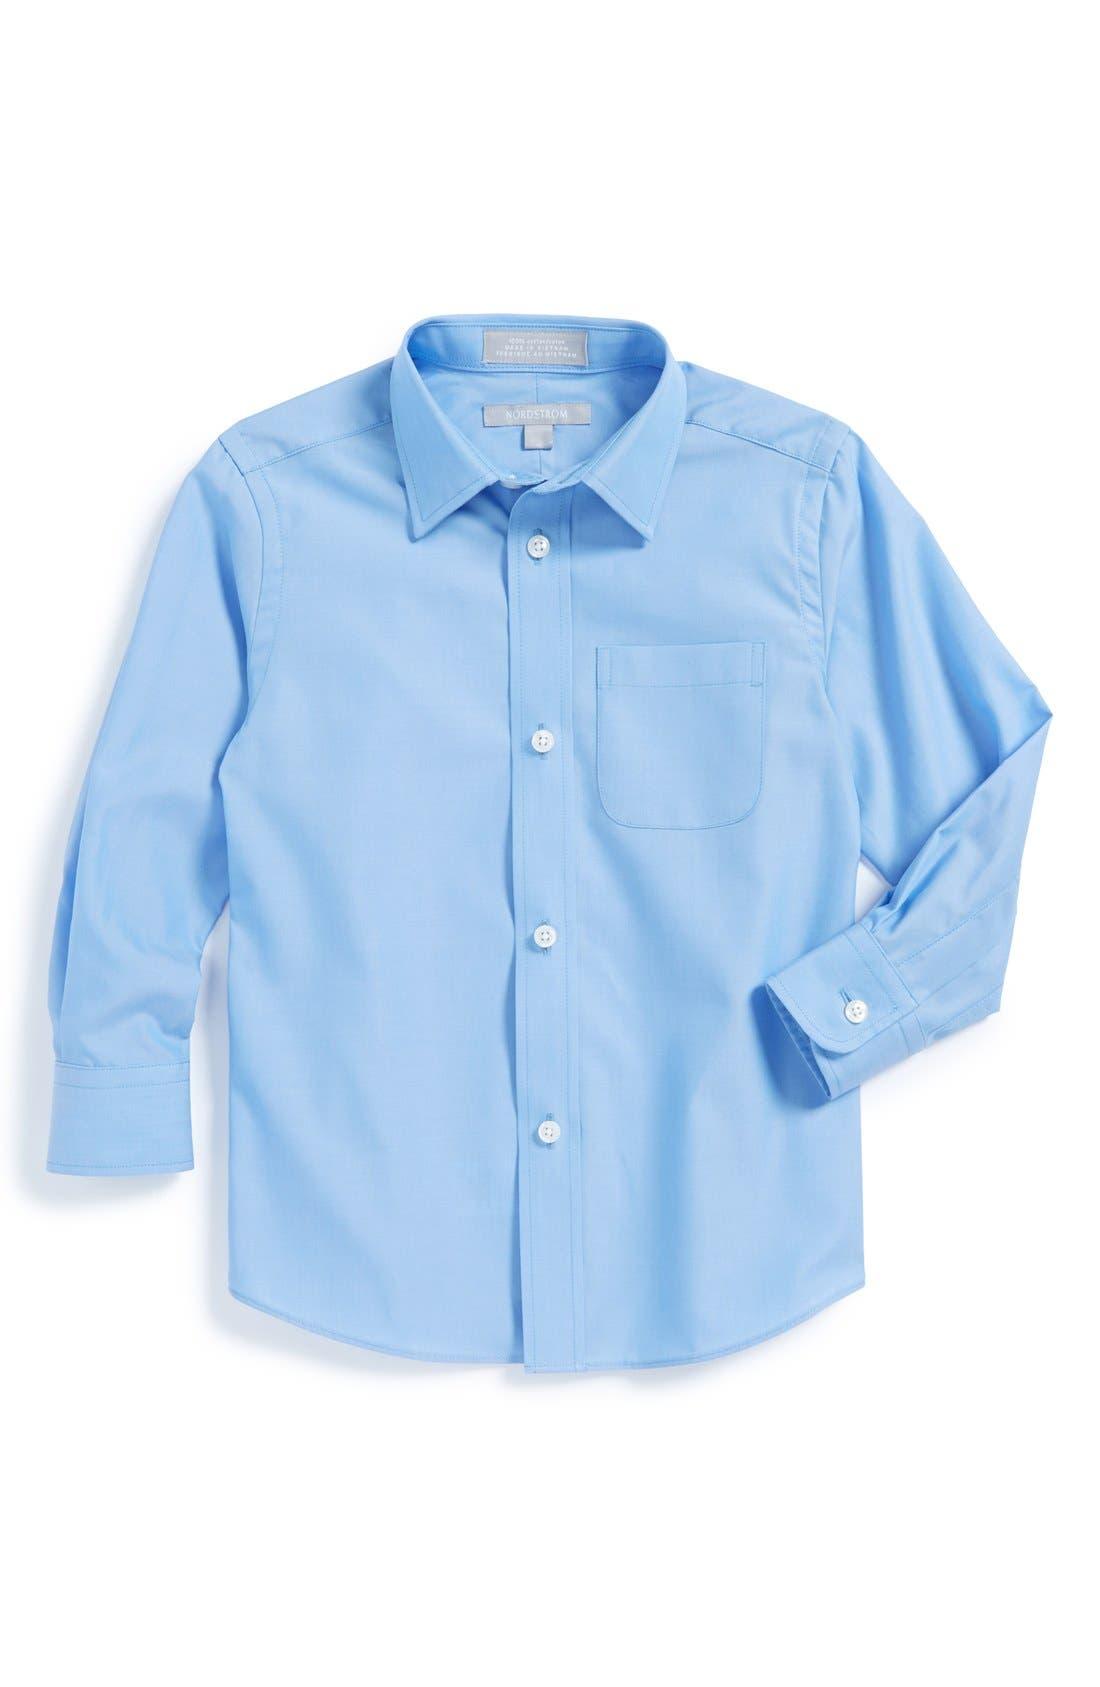 Cotton Poplin Dress Shirt,                             Main thumbnail 1, color,                             BLUE SMART